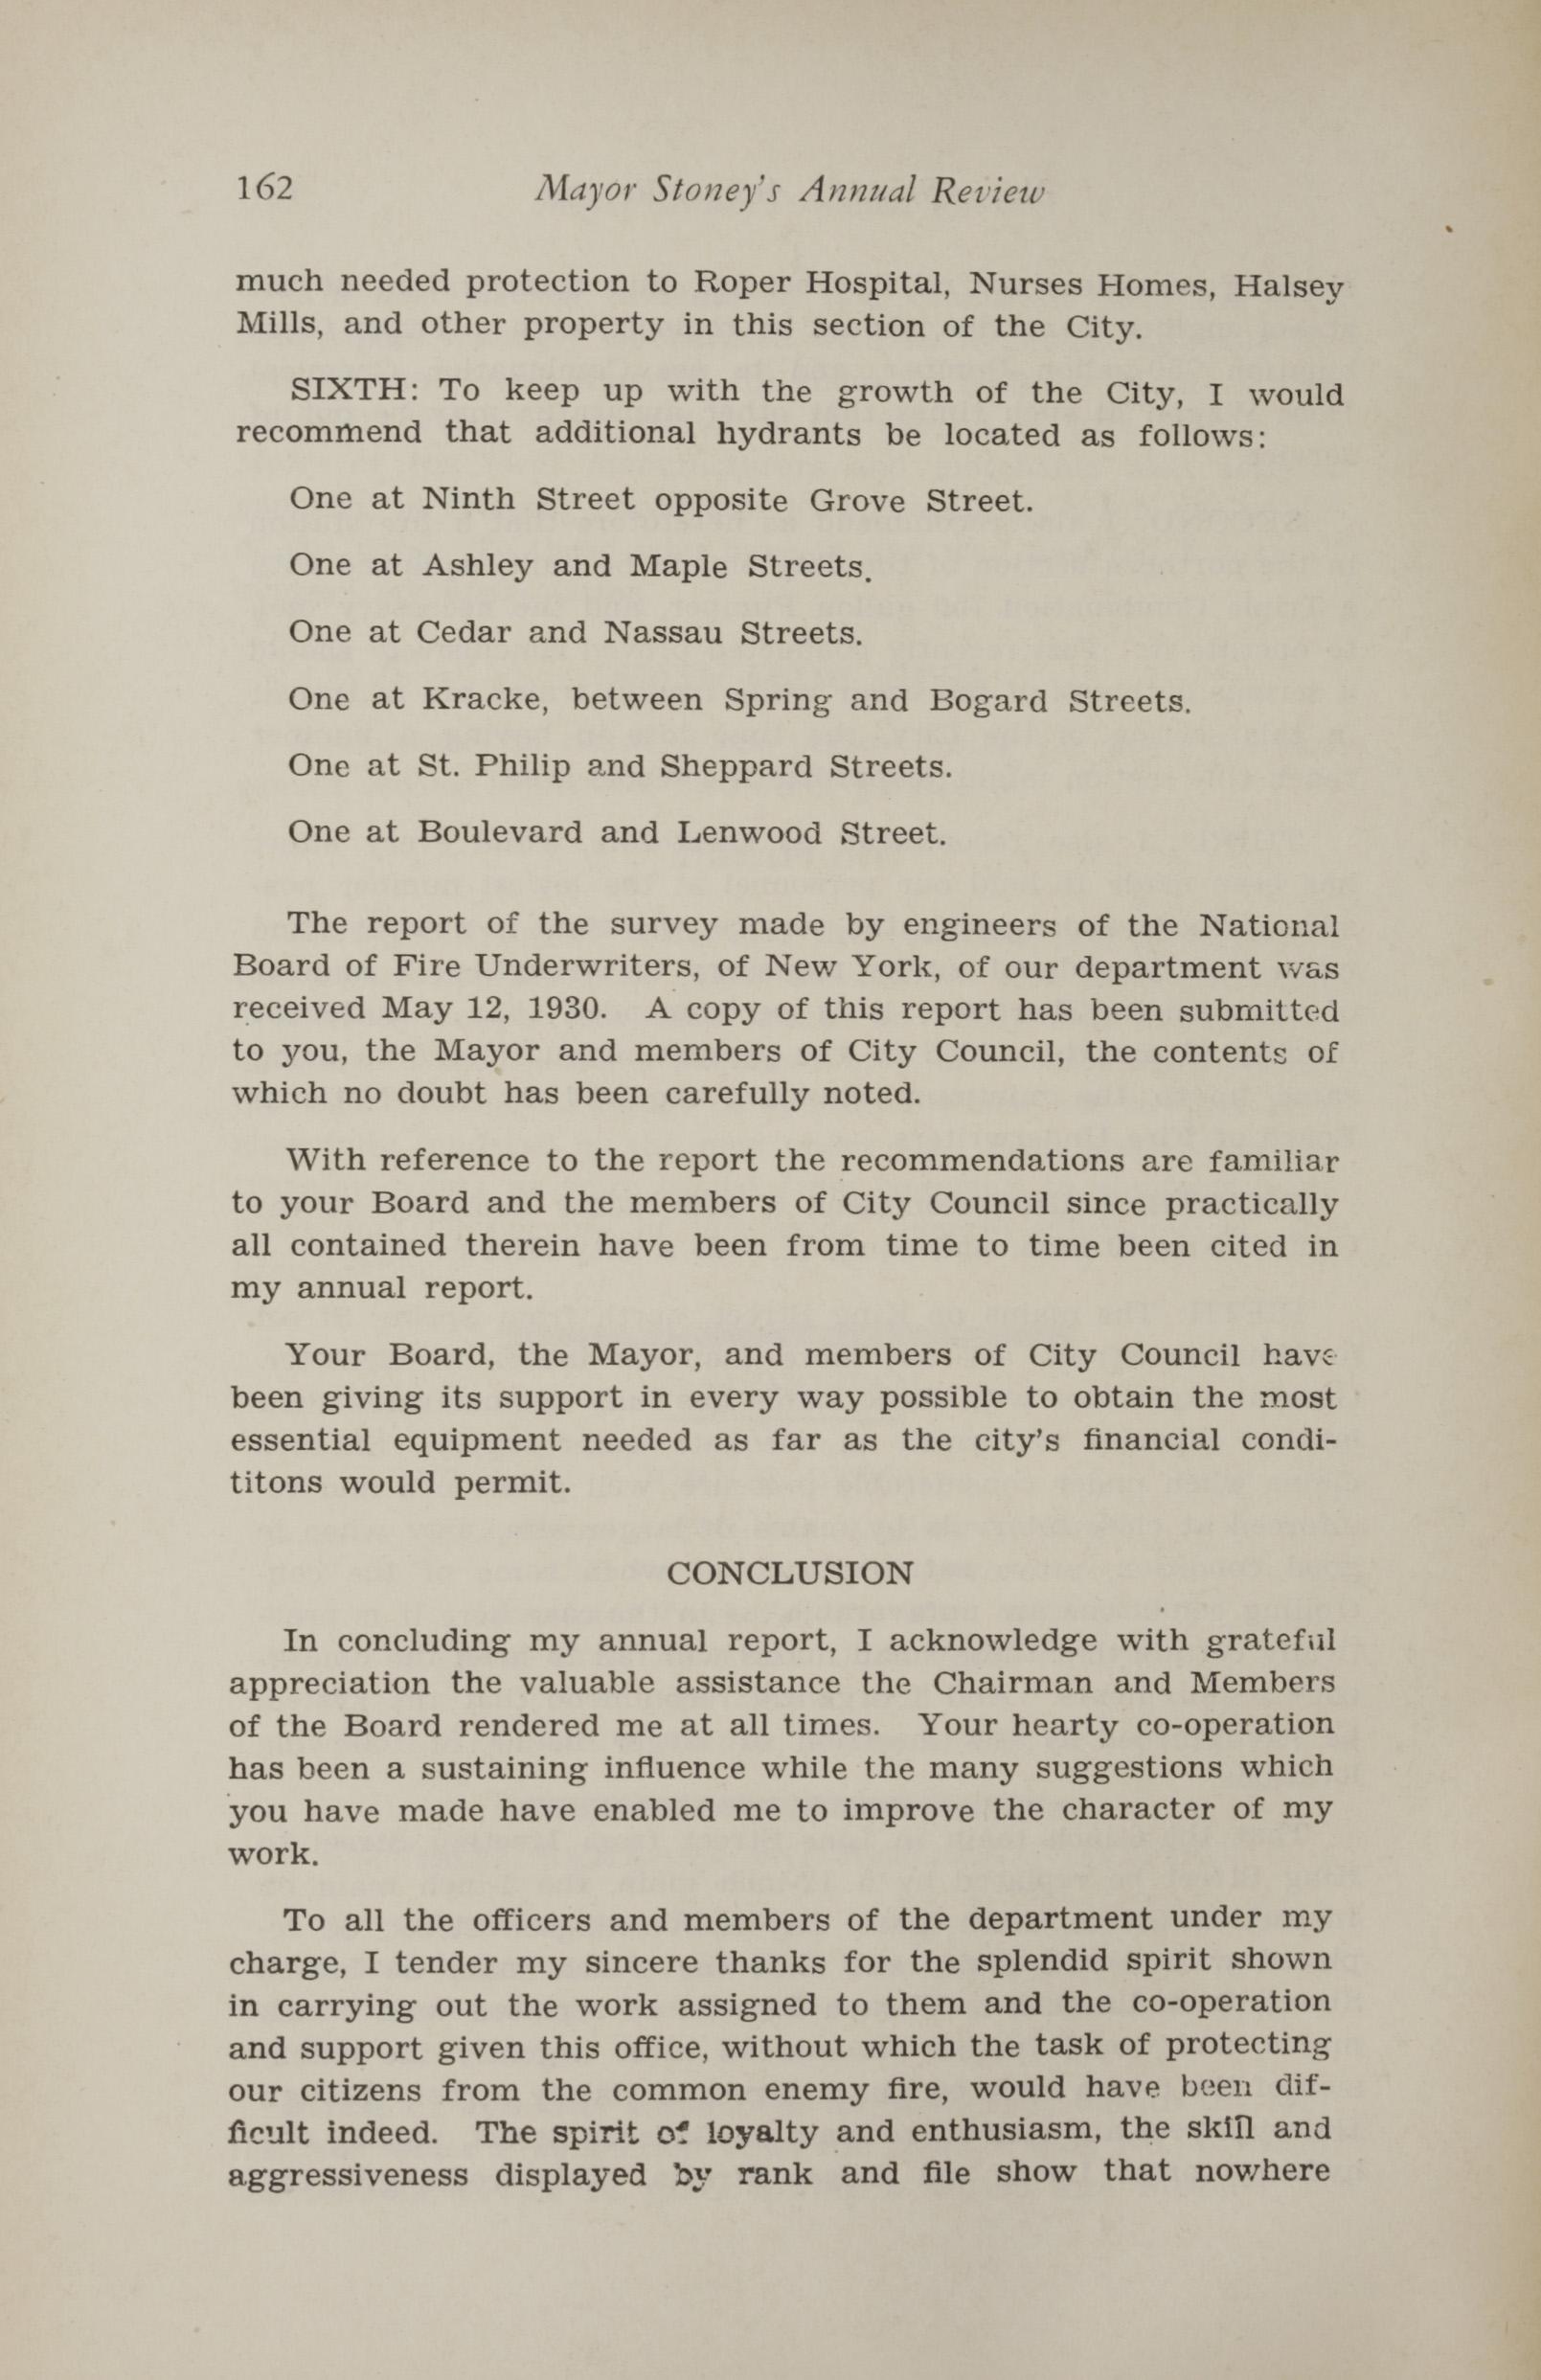 Charleston Yearbook, 1930, page 162